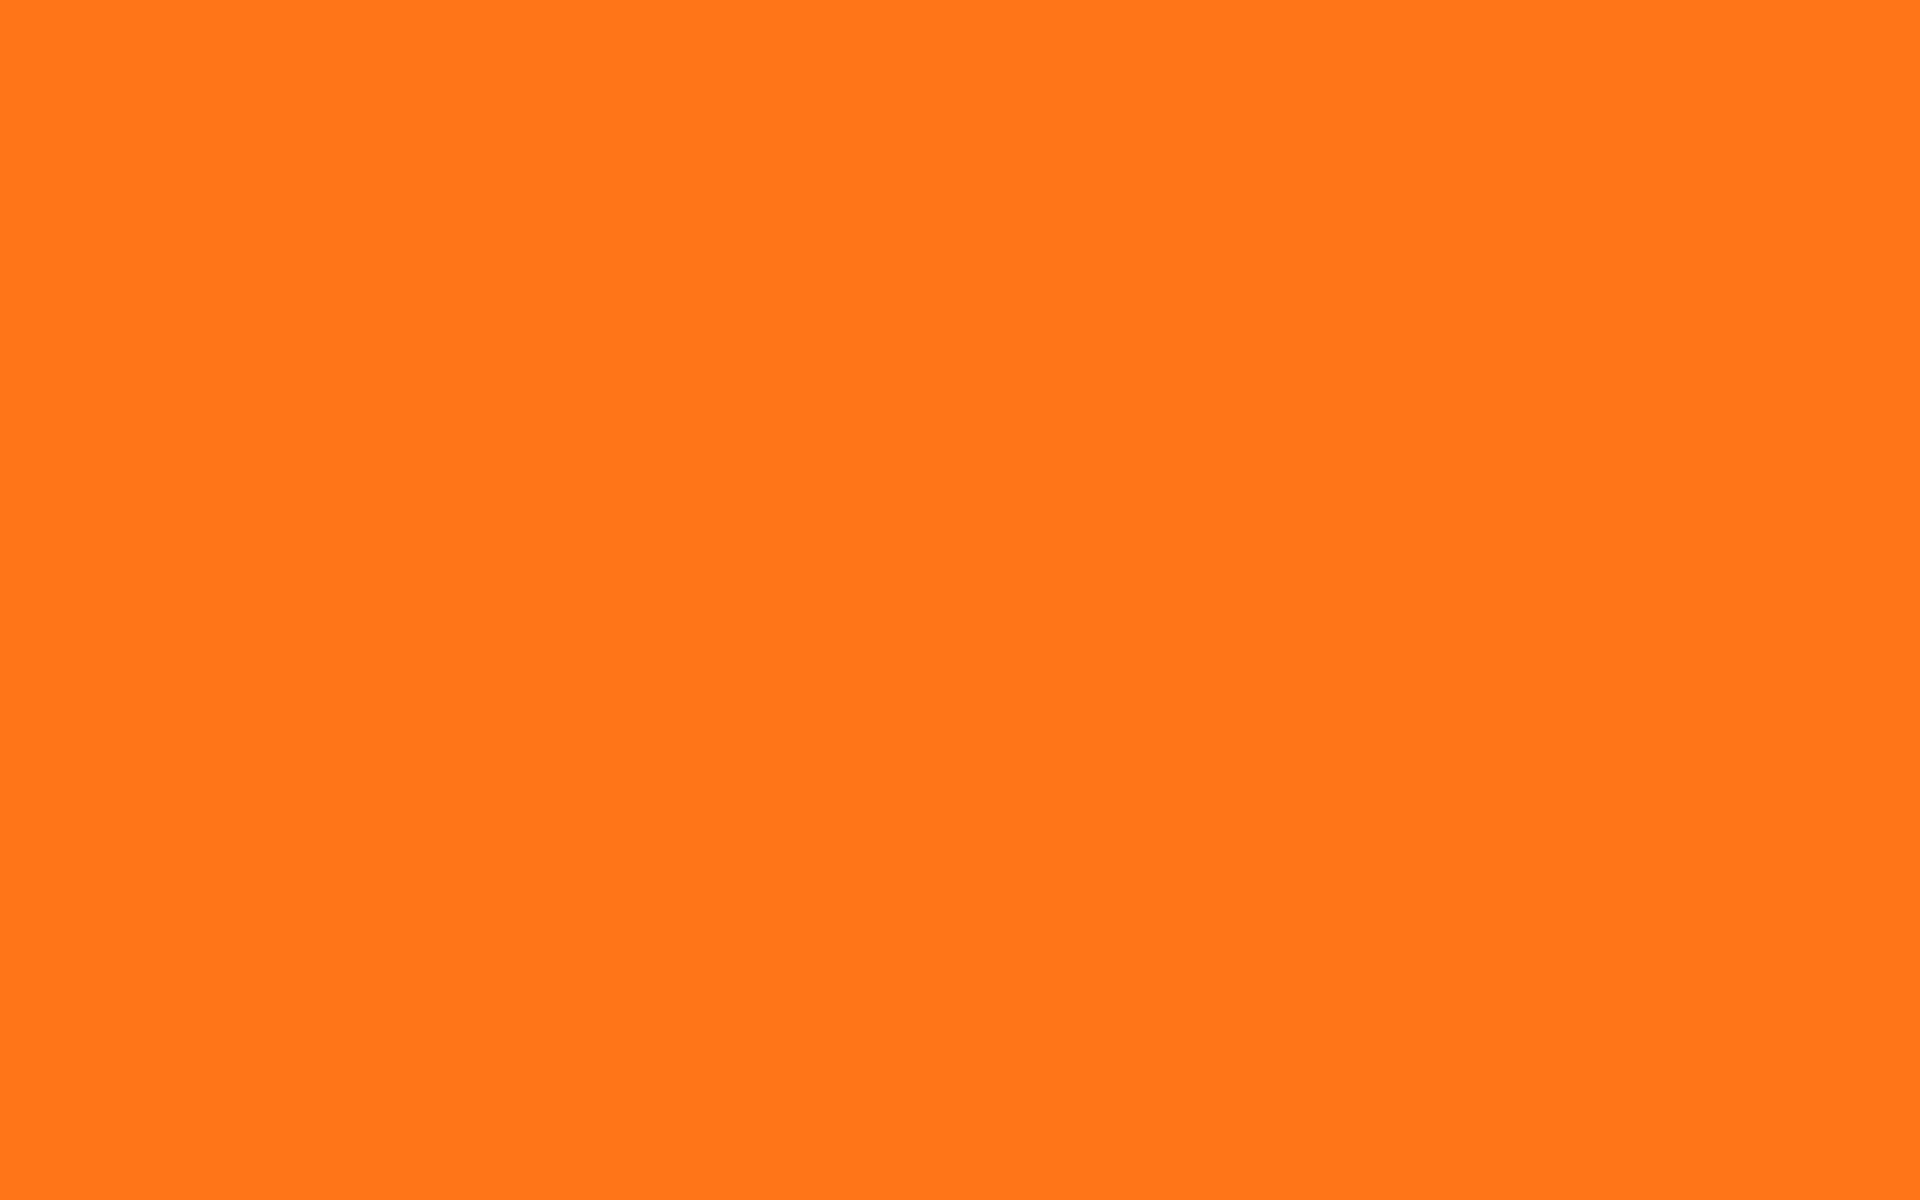 1920x1200 Pumpkin Solid Color Background